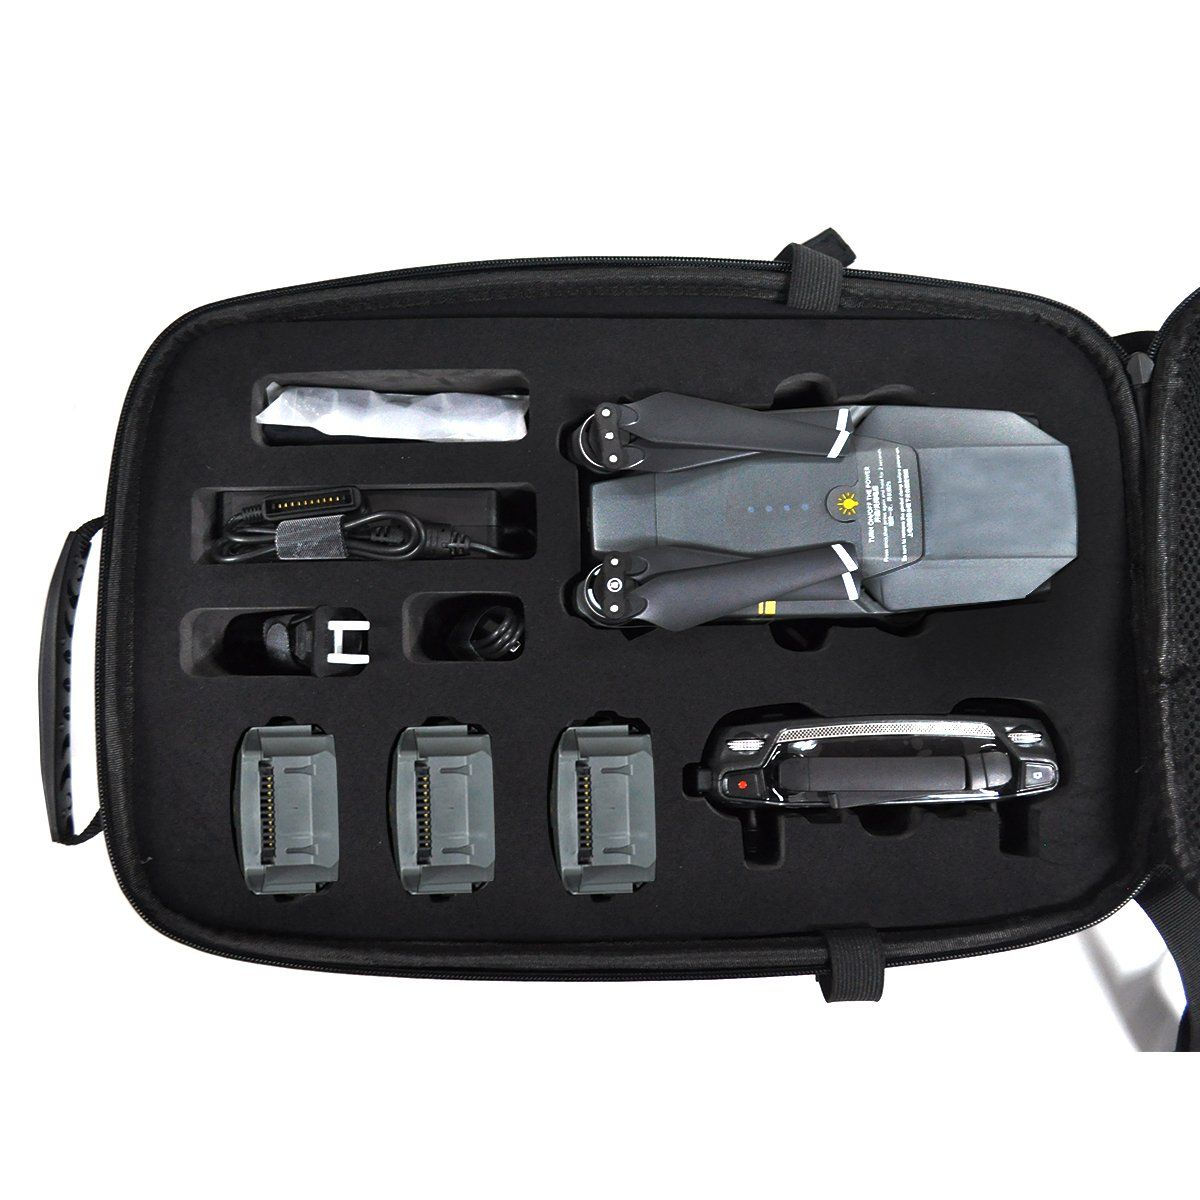 Mavic Pro Shoulder Bag Waterproof Backpack Can Store 10